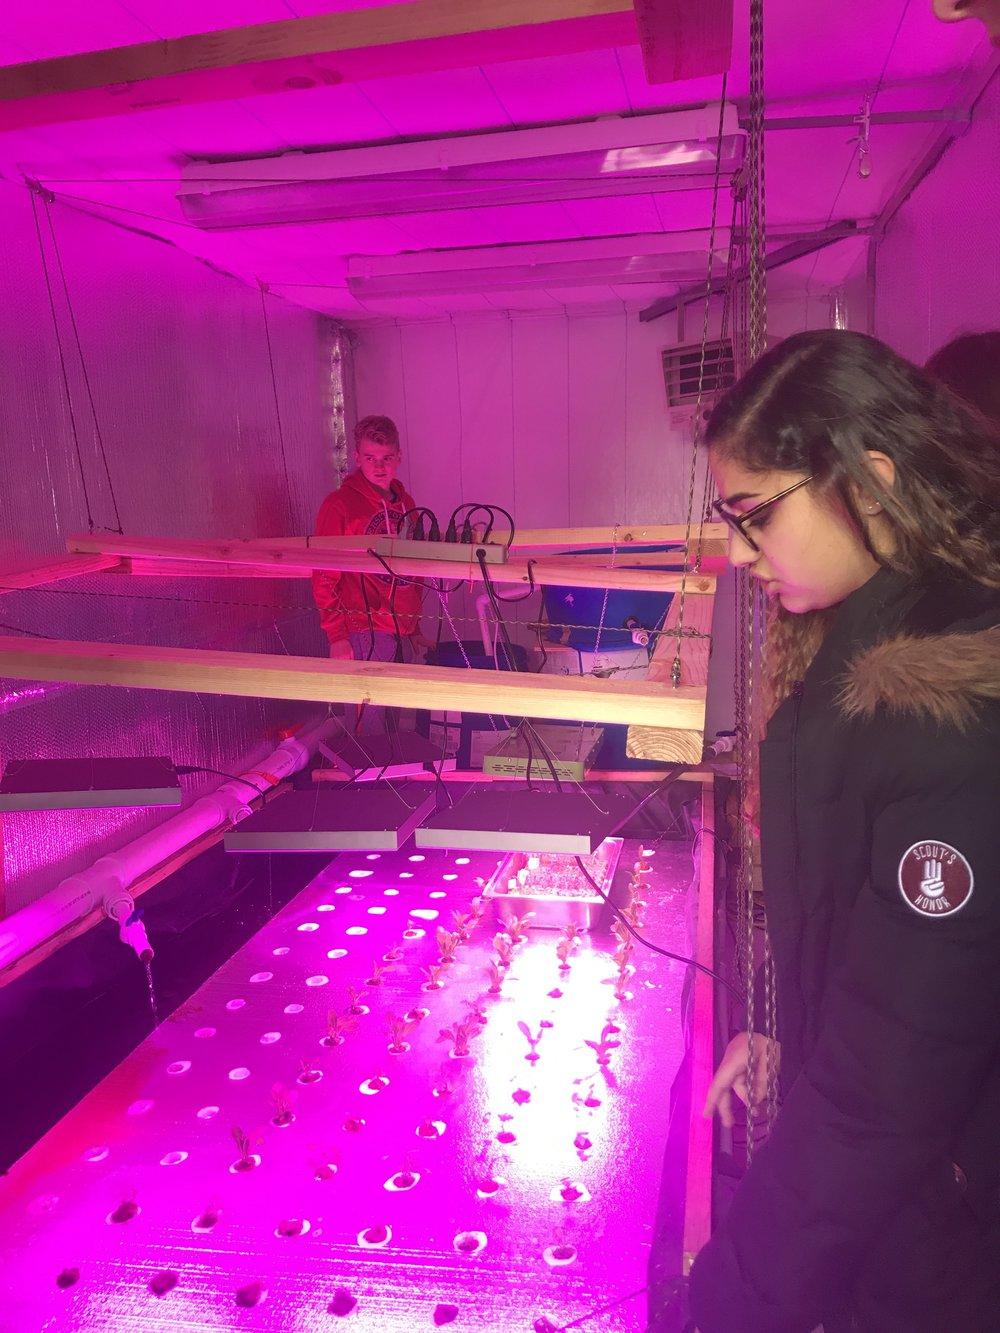 Aquaponics in action